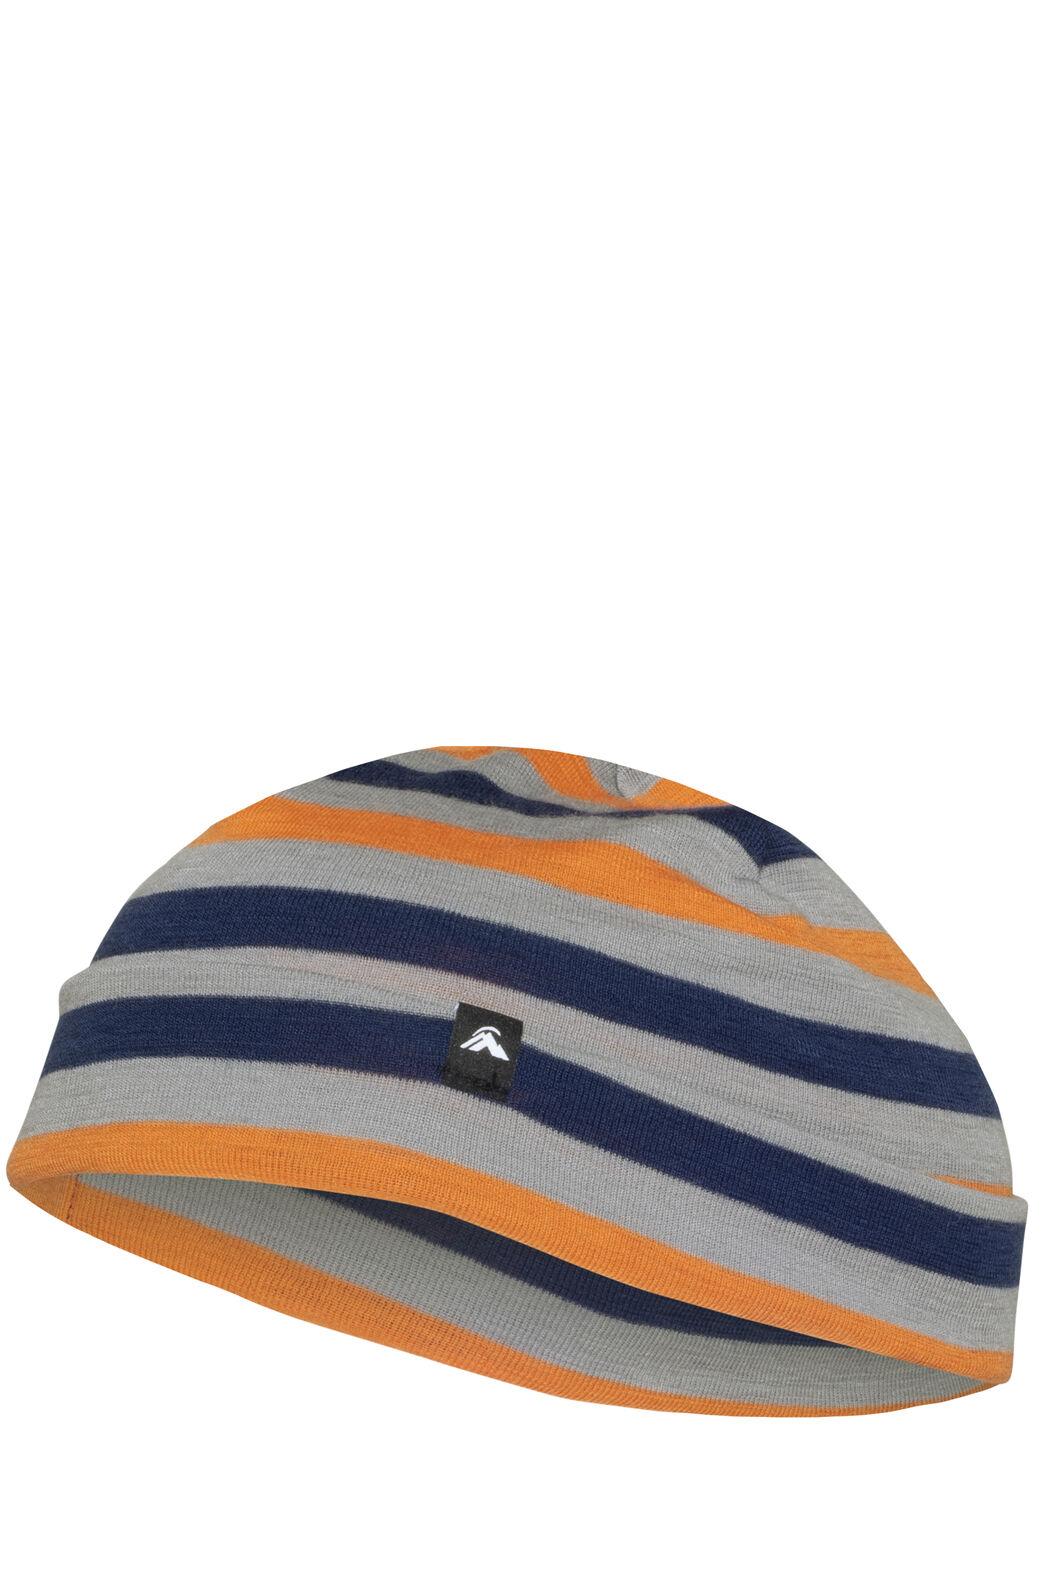 Macpac 220 Merino Beanie — Kids', Blueprint Stripe, hi-res